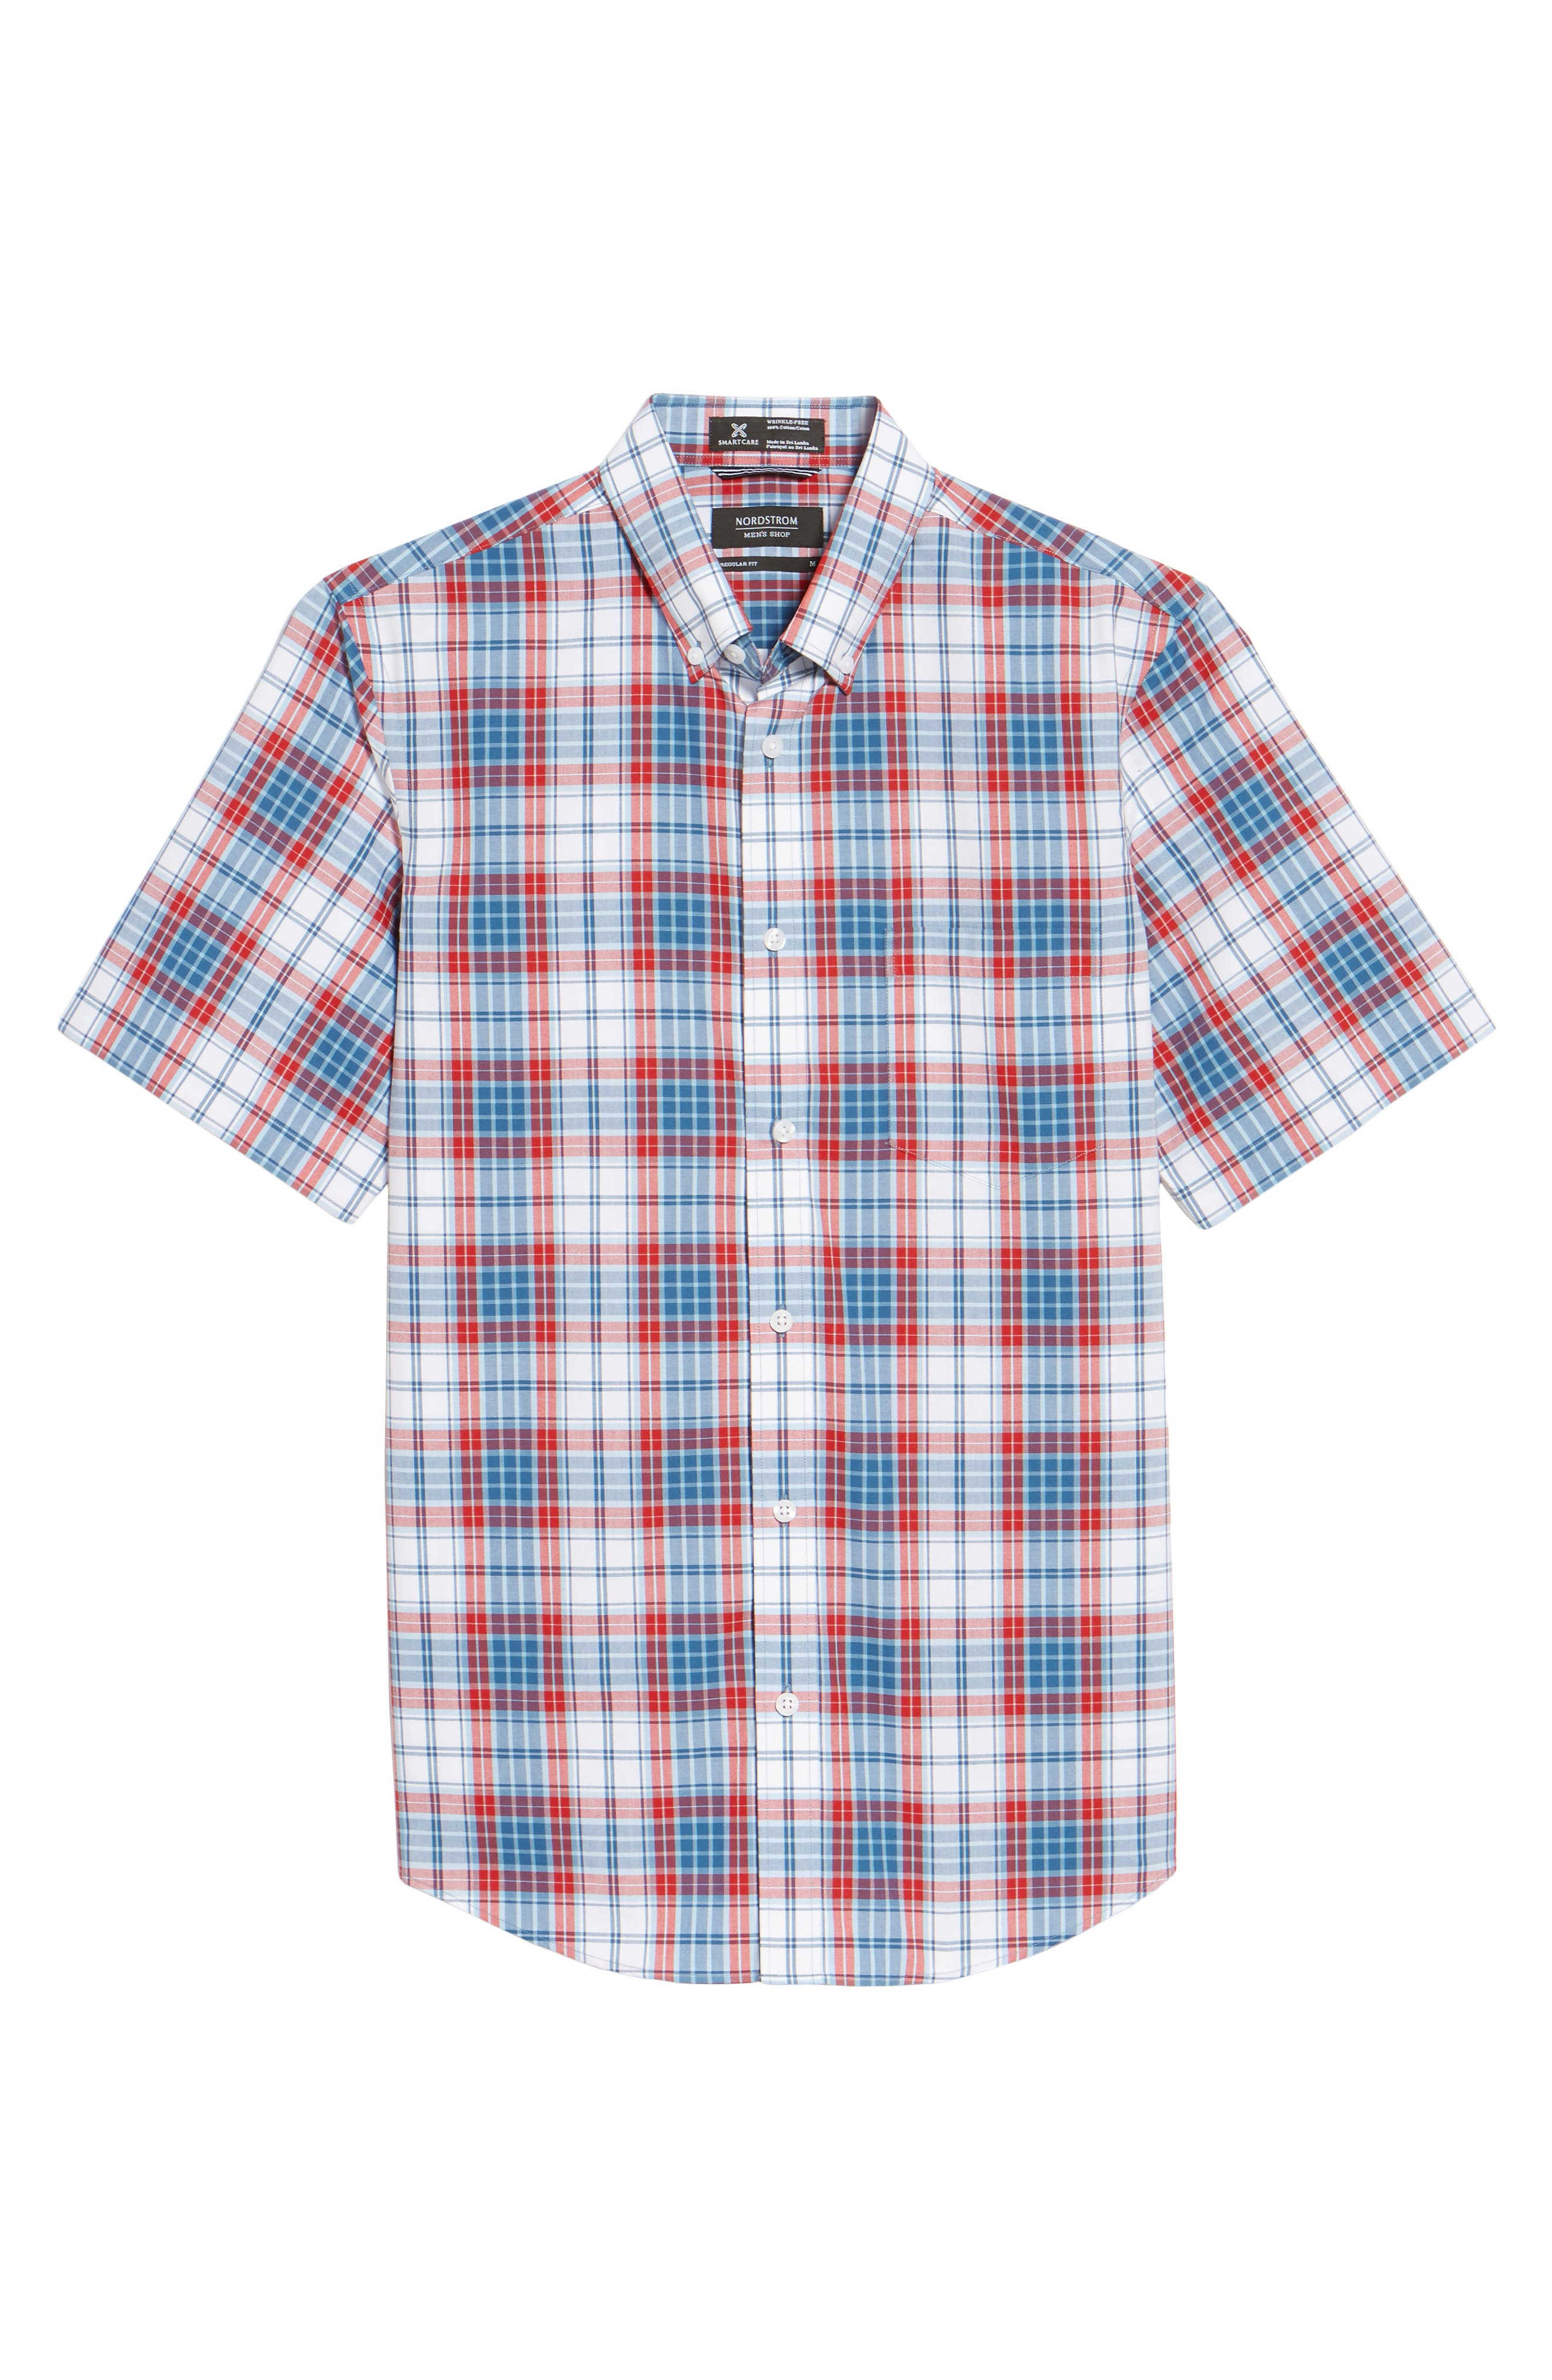 Smartcare<sup>™</sup> Regular Fit Plaid Sport Shirt,                             Alternate thumbnail 6, color,                             White Red Heather Tartan